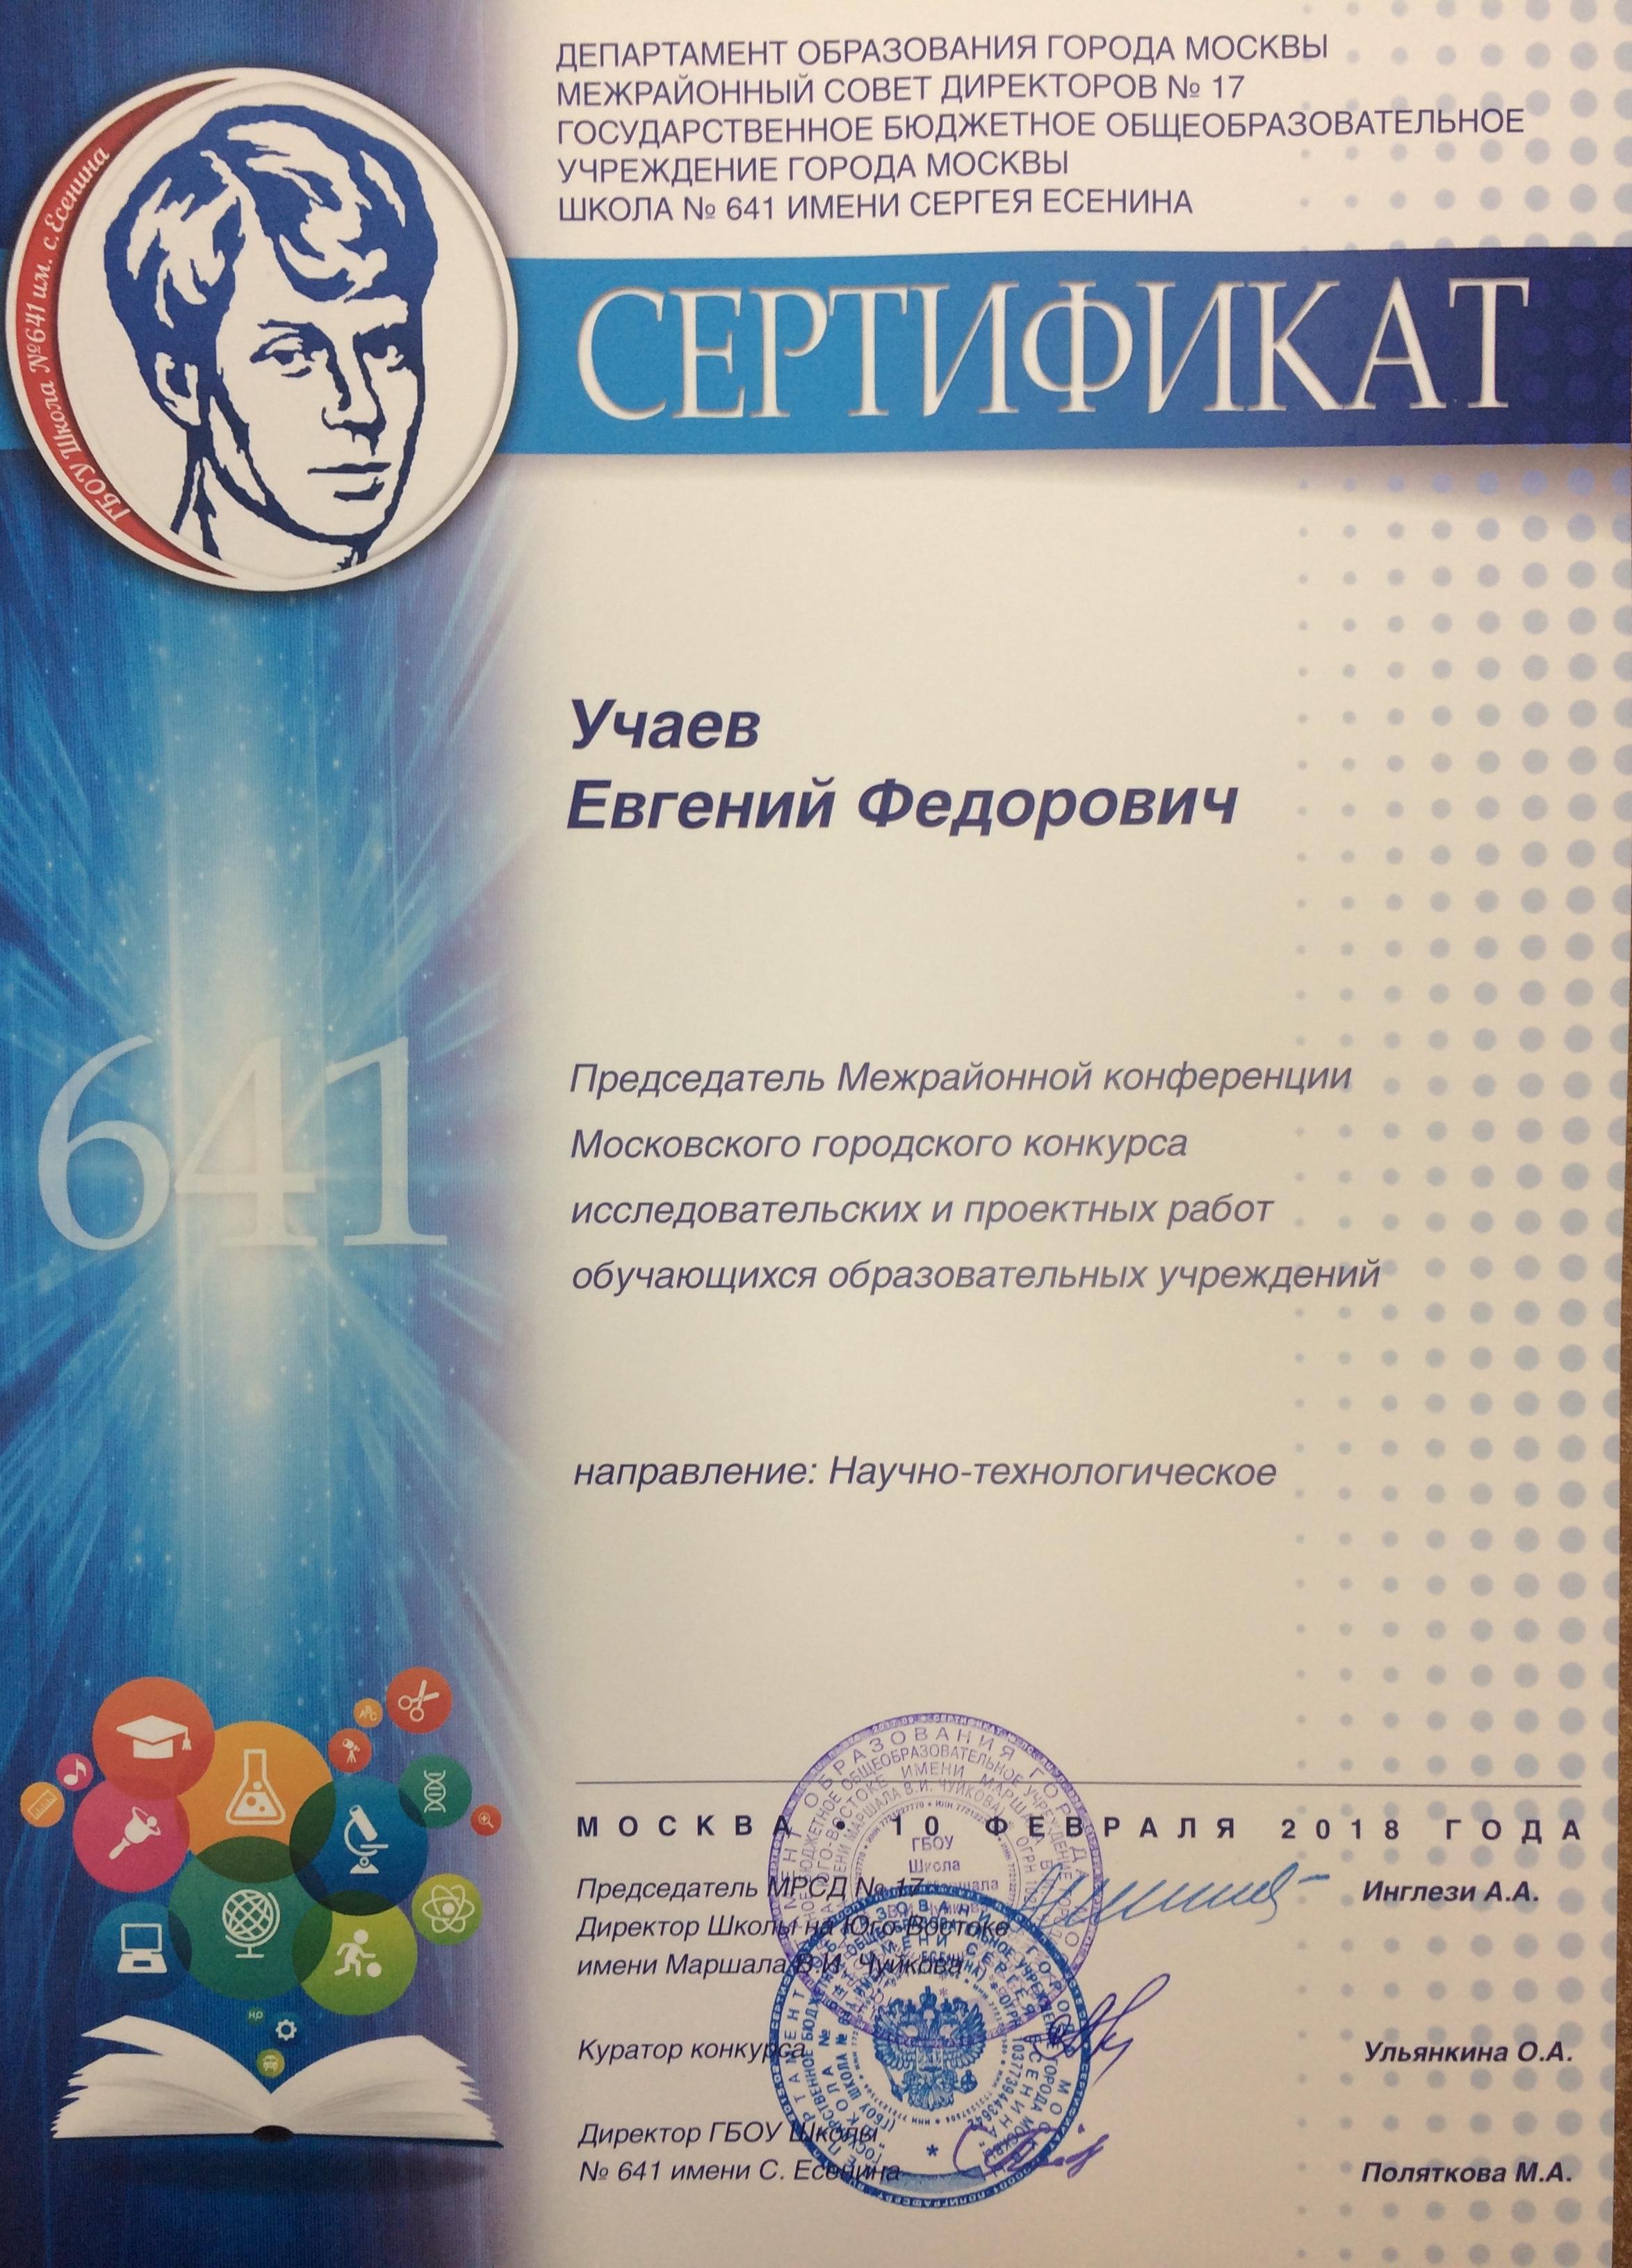 Сертификат МГК 2018